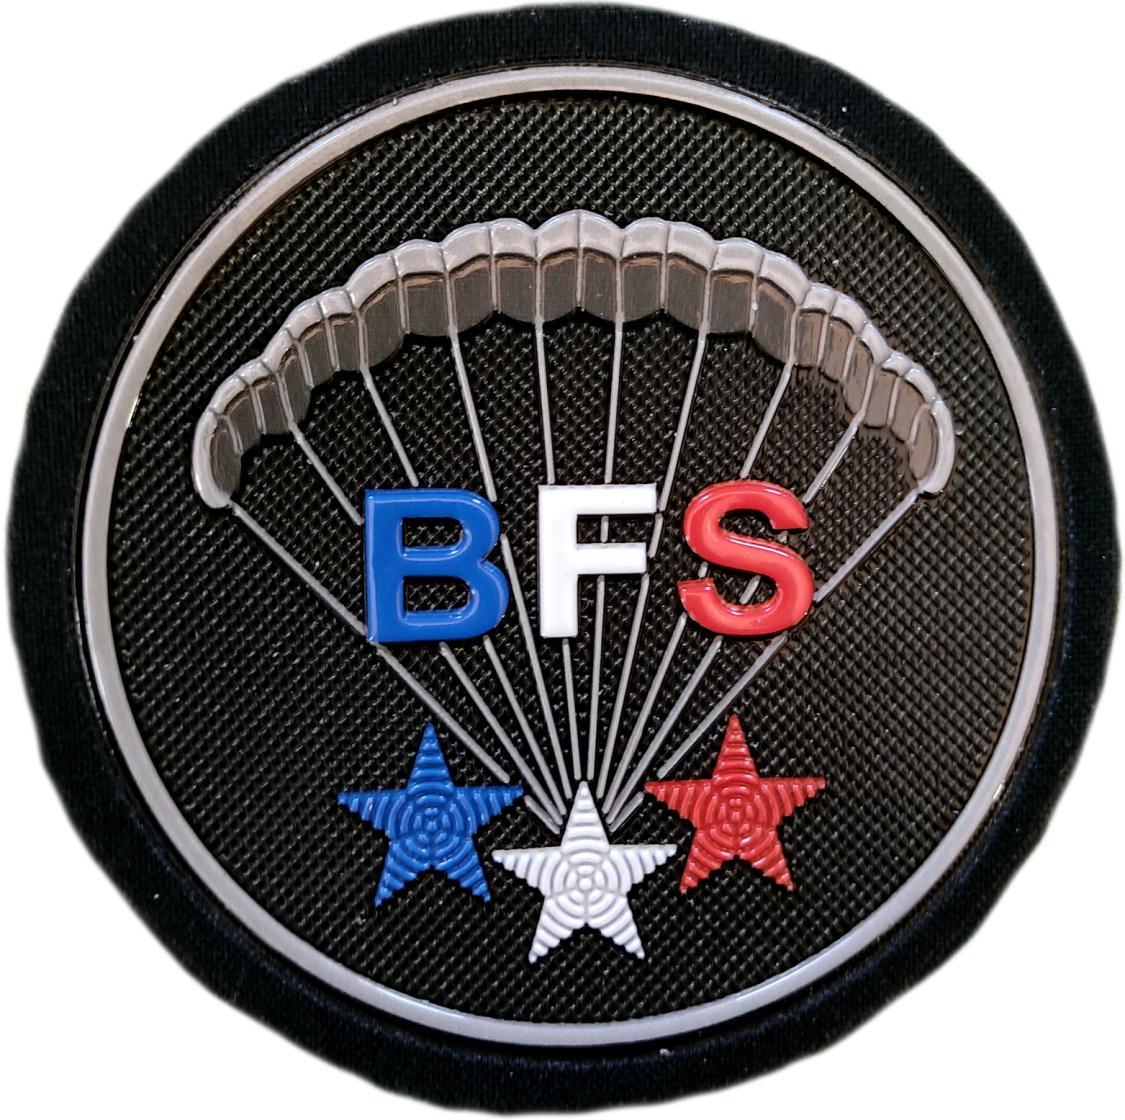 Ejercito Francia BFS Bureau Fuerzas Especiales Paracaidistas Bureau Forces Specials Parachutistes parche insignia emblema distintivo